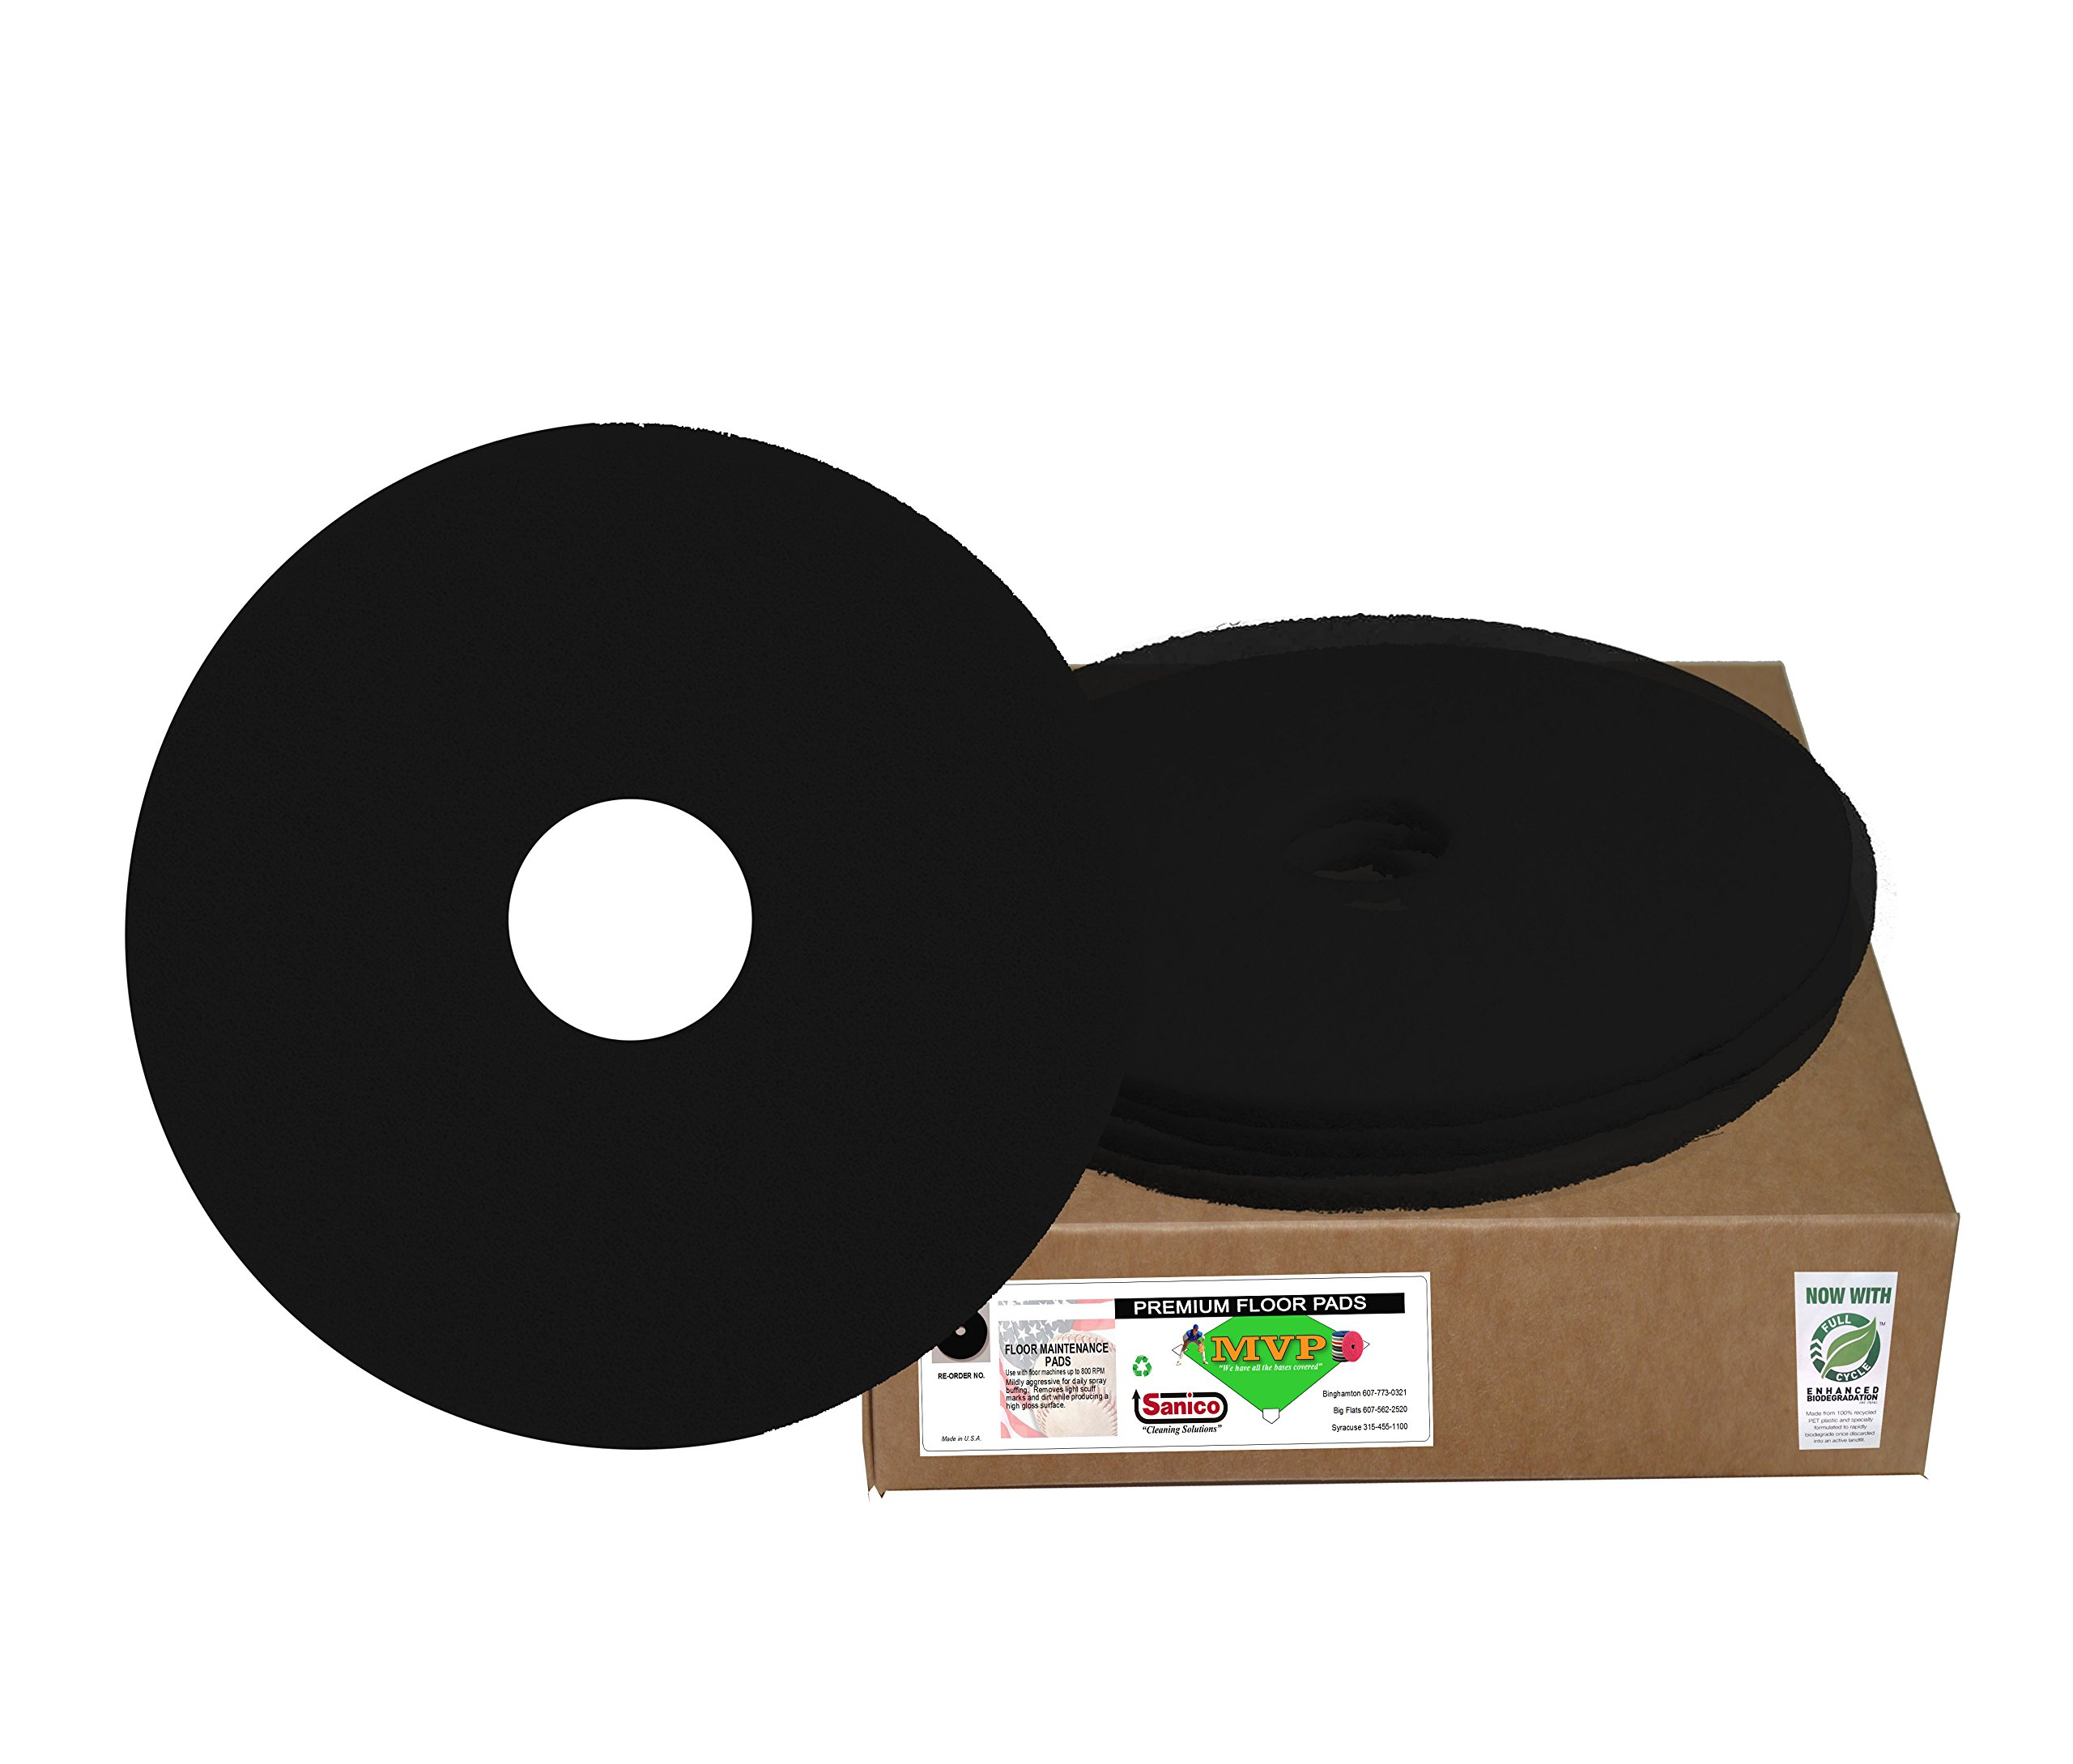 Sanico MVP Reliever 19'' Black Stripping Floor Pad Wet Strip (5 per case) -(1 CASE) by Sanico